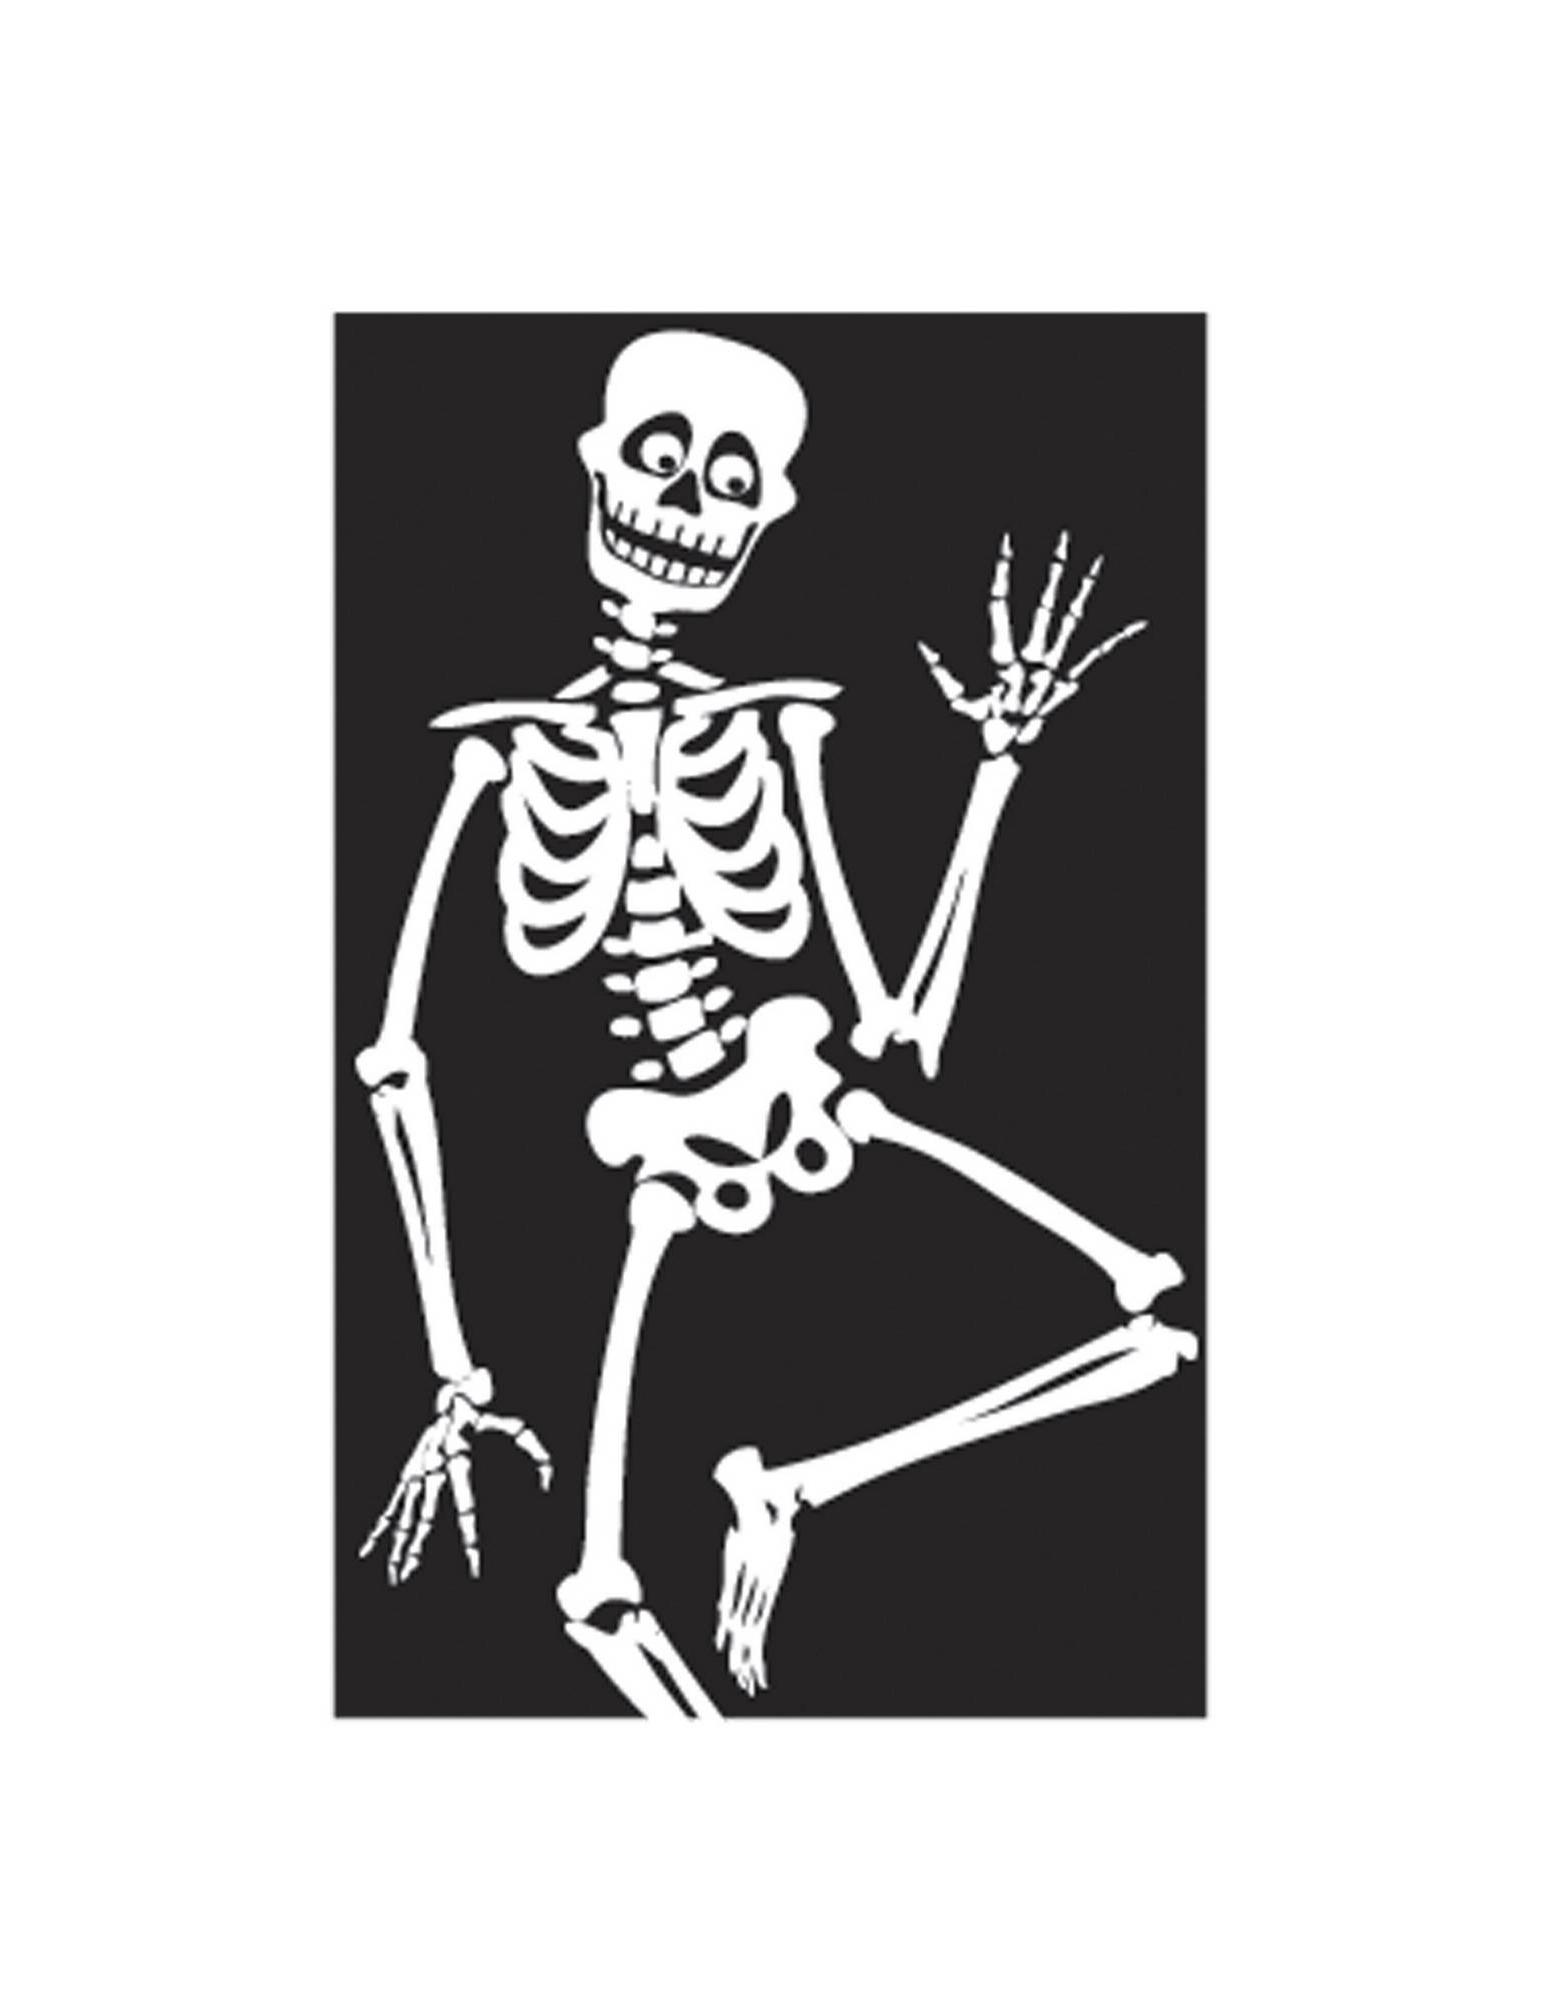 Skelet Voor Halloween.Spook Of Skelet Raamversiering Halloween